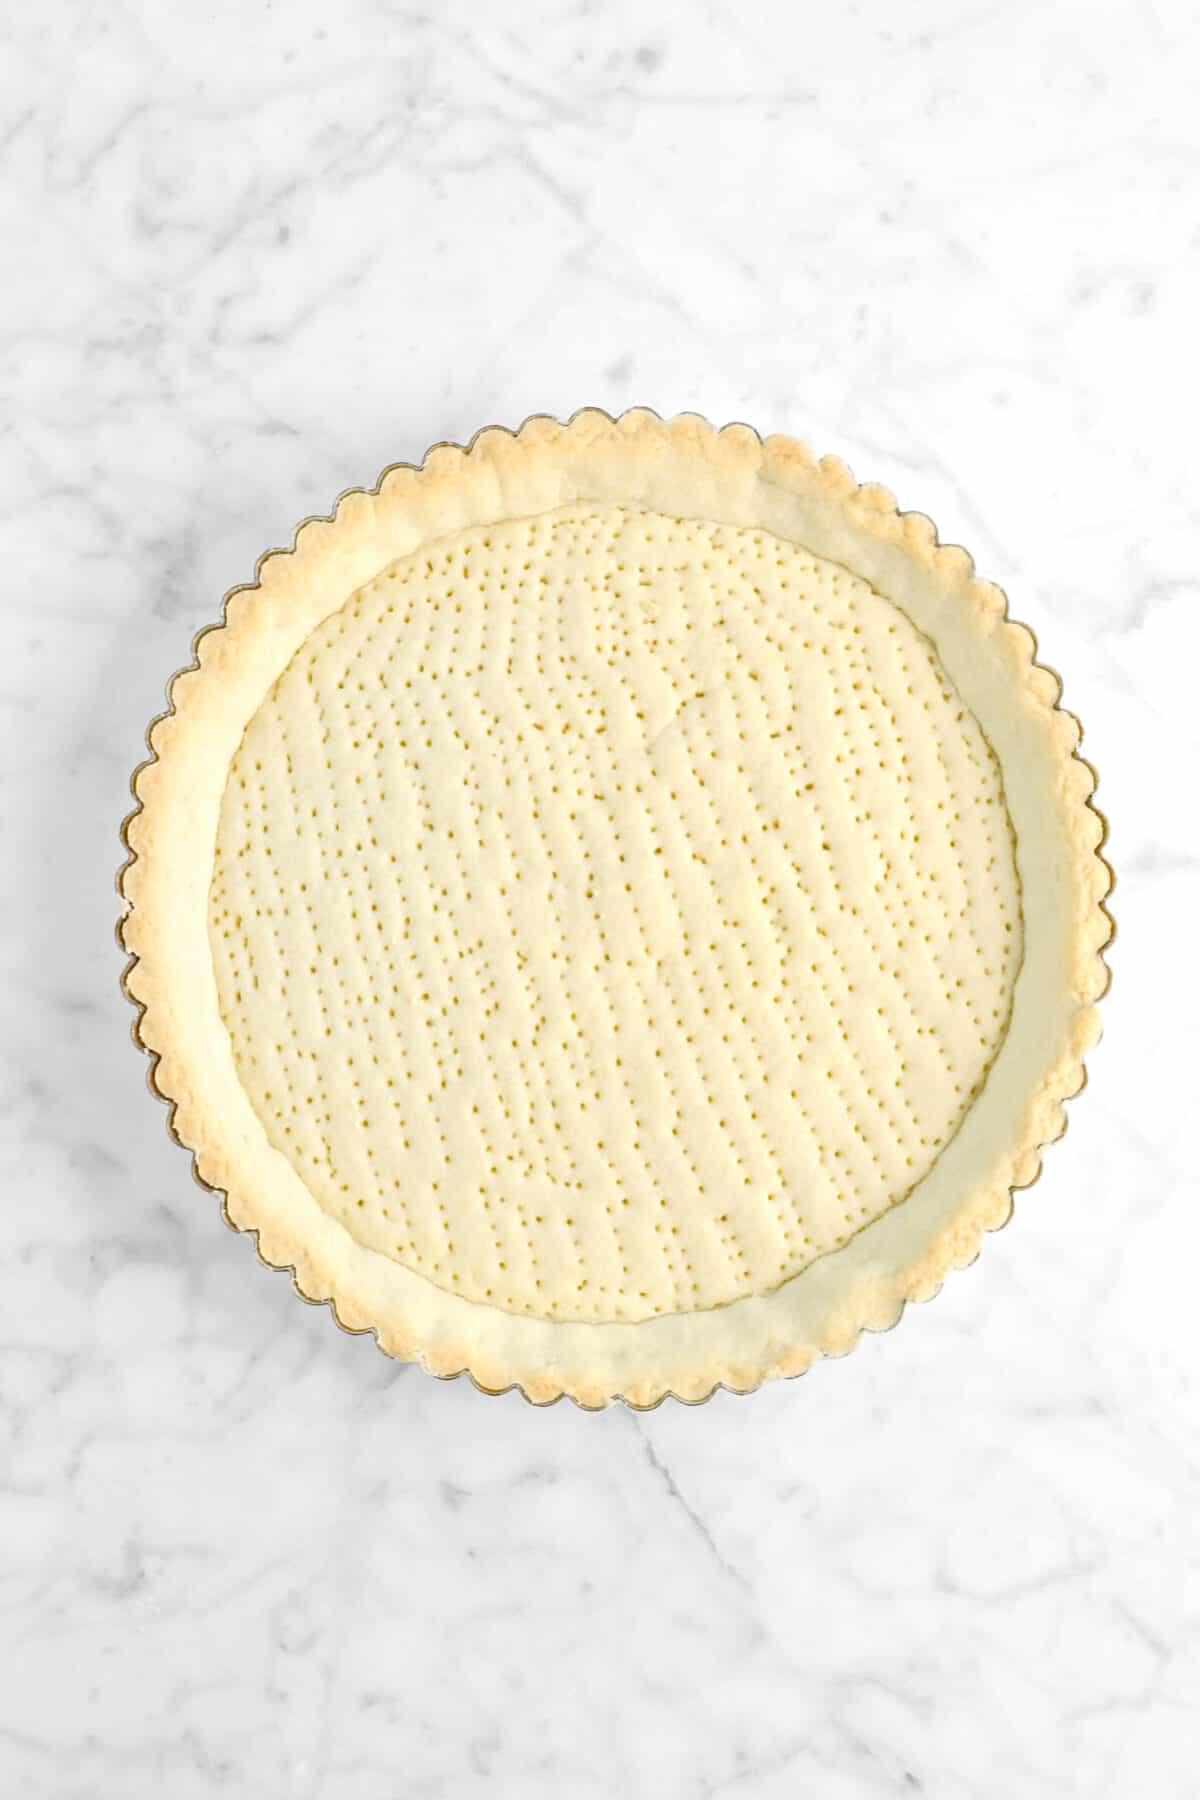 baked tart shell on marble counter